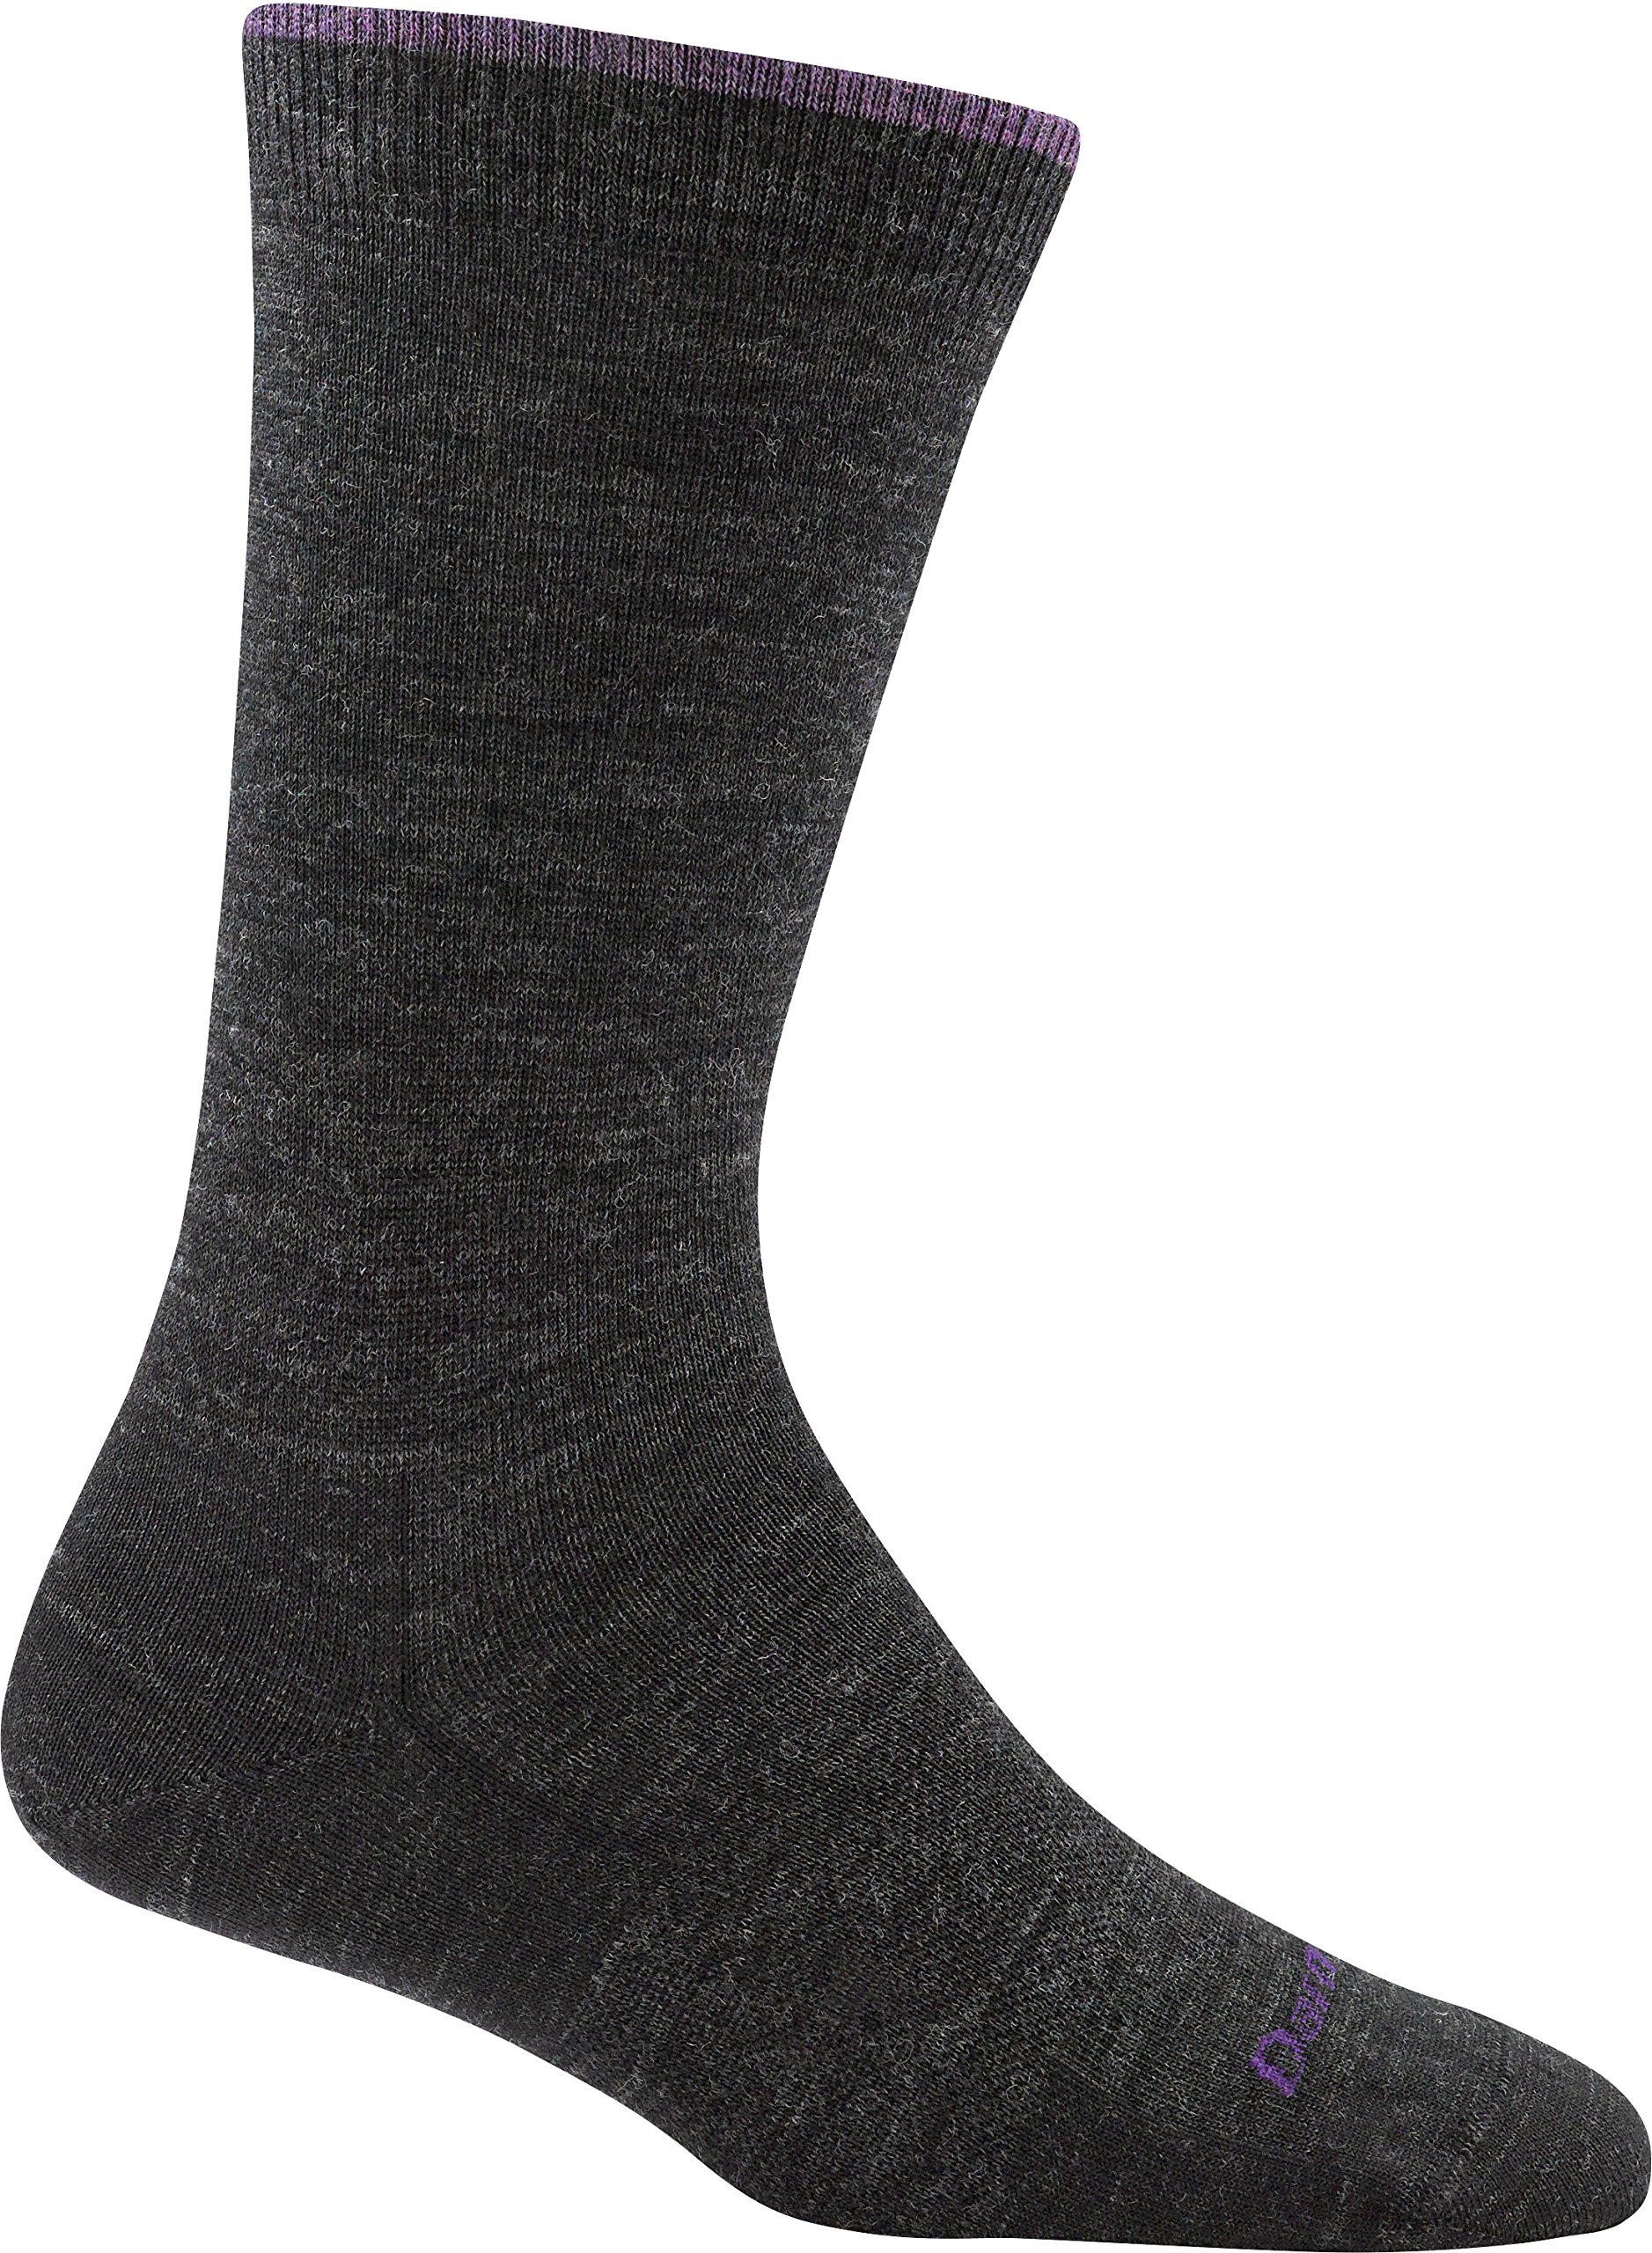 Darn Tough Women's Wool Light Sock -6 Pack Special Offer,Charcoal,Medium by Darn Tough